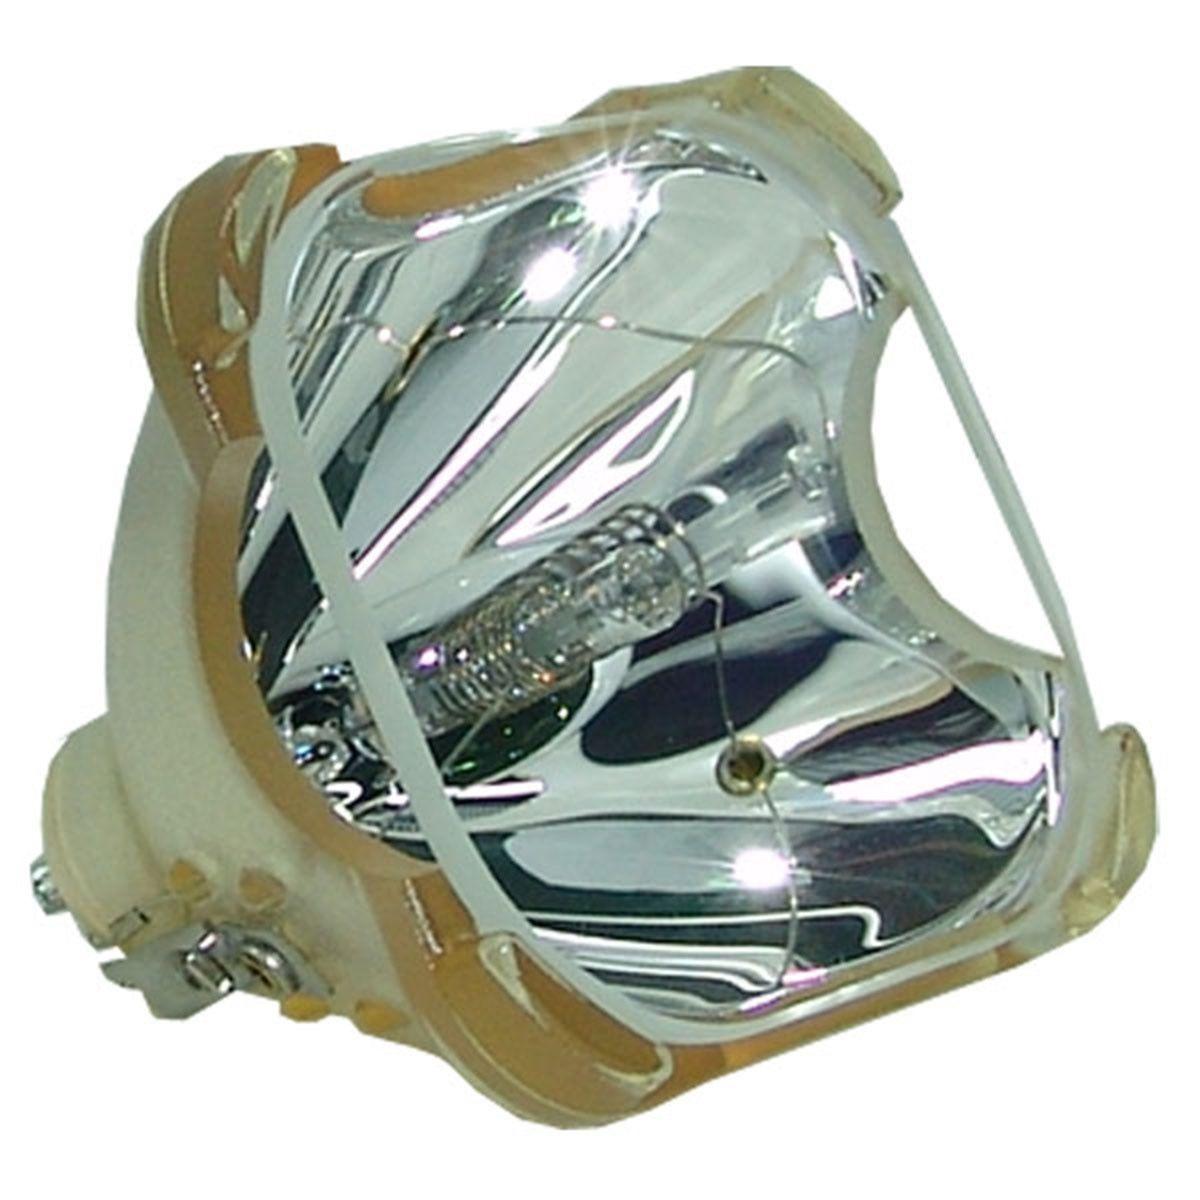 Compatible Bare Bulb ELPLP22 V13H010L22 for Epson EMP-7800 EMP-7850 EMP-7900 EMP-7900NL EMP-7950 PowerLite 7900 Projector Lamp compatible bare bulb elplp29 v13h010l29 for epson emp tw10h emp s1 emp s1h powerlite home 10 s1 s1h projector bulb lamp